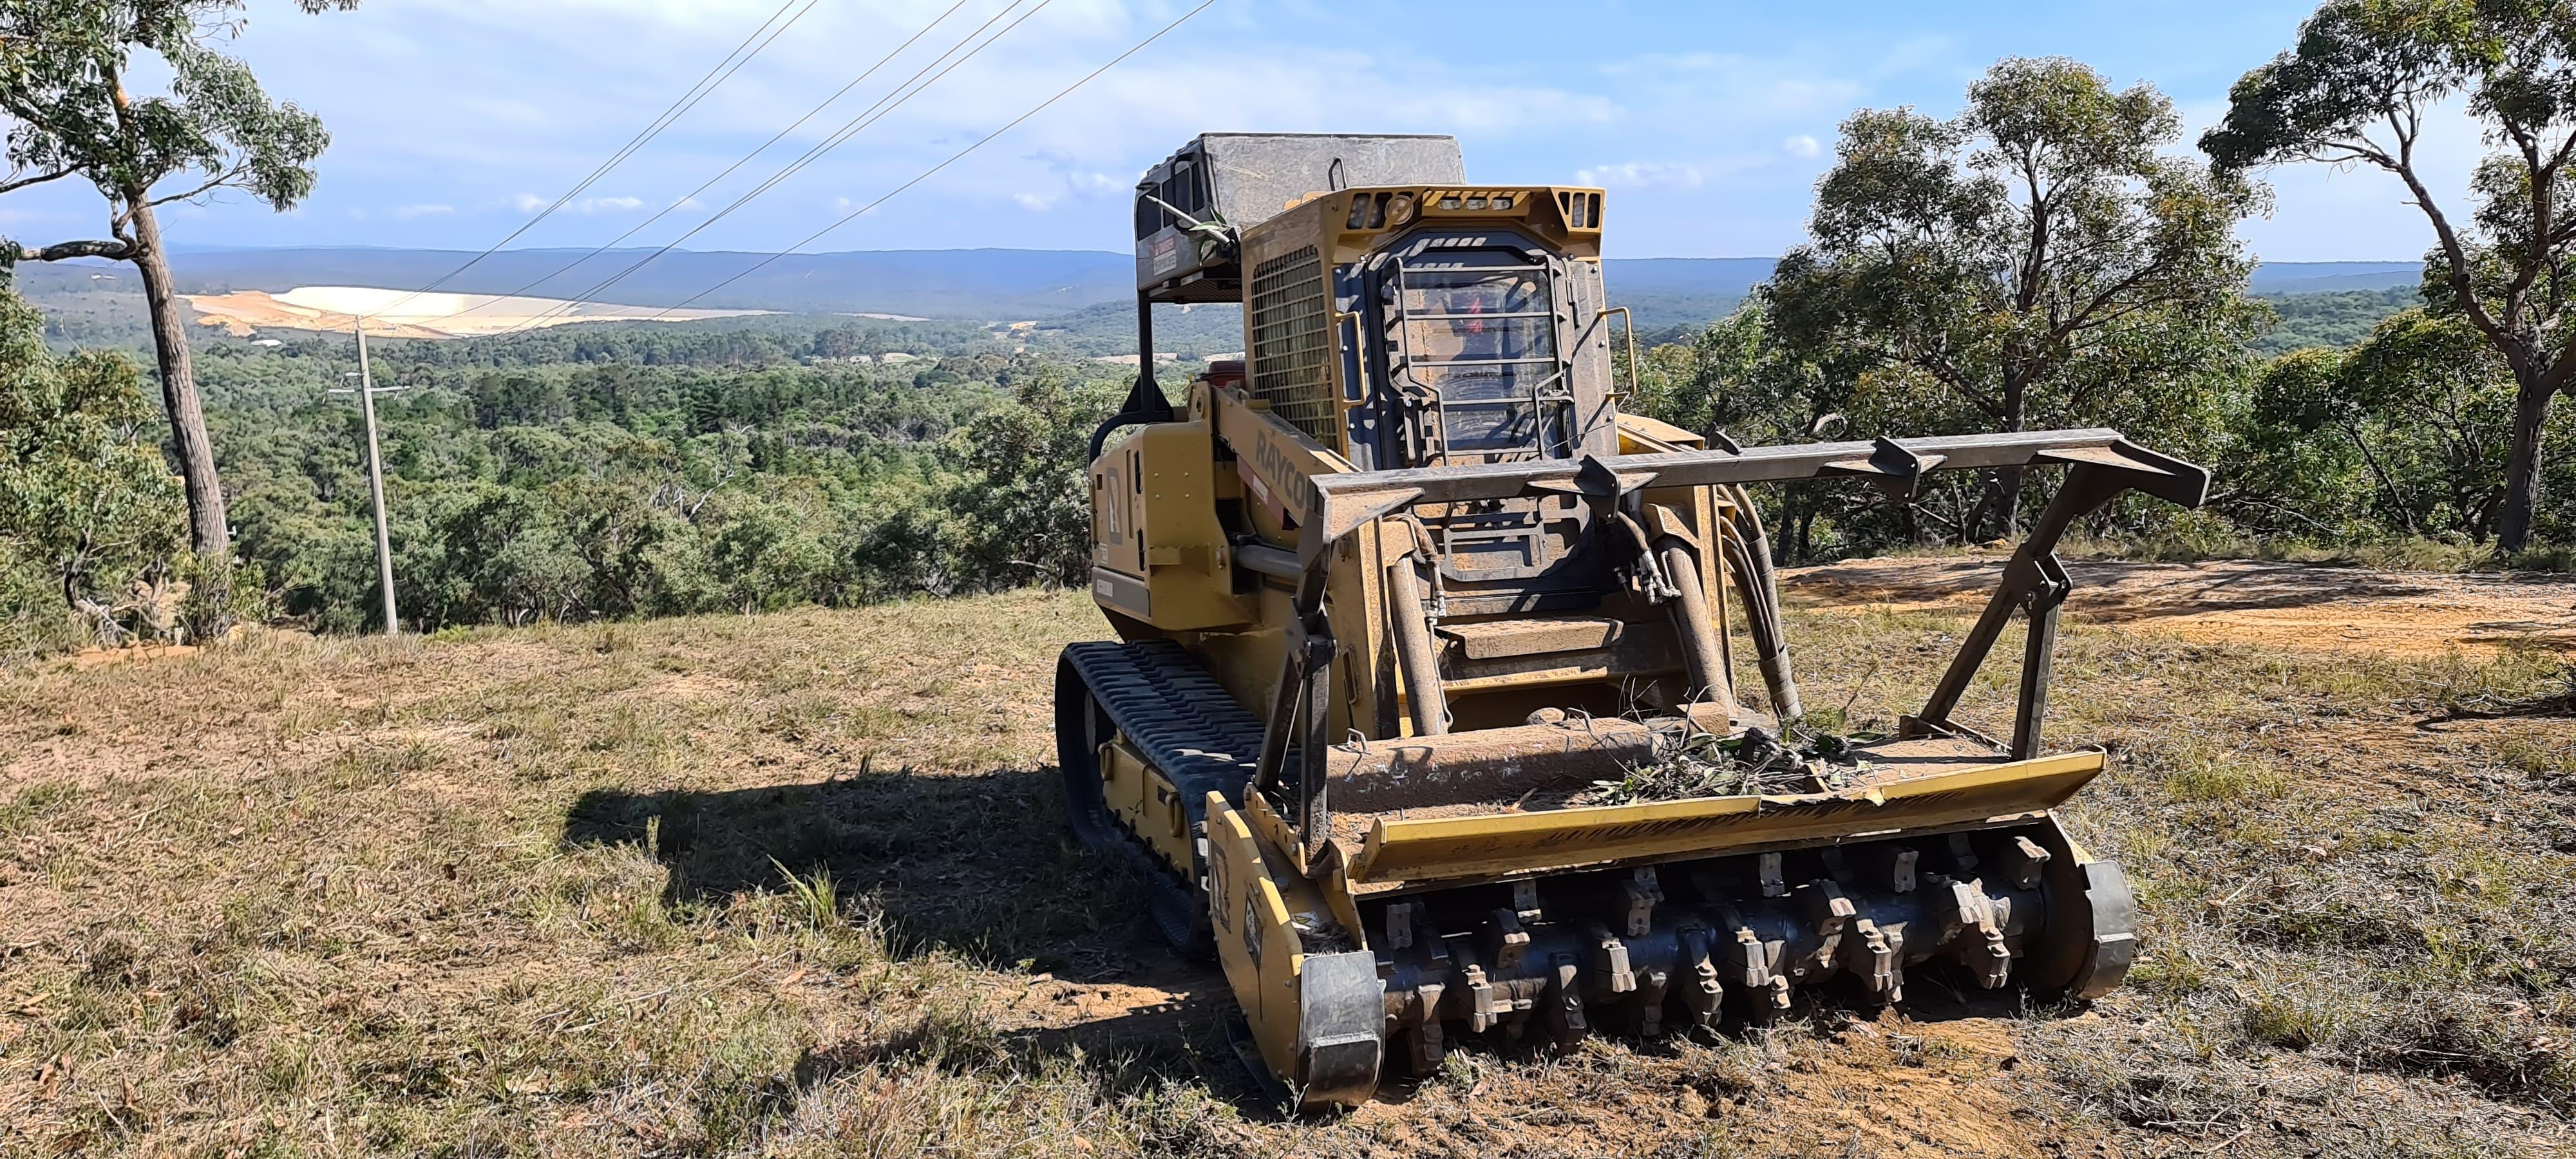 Rayco C100R Forestry Mower